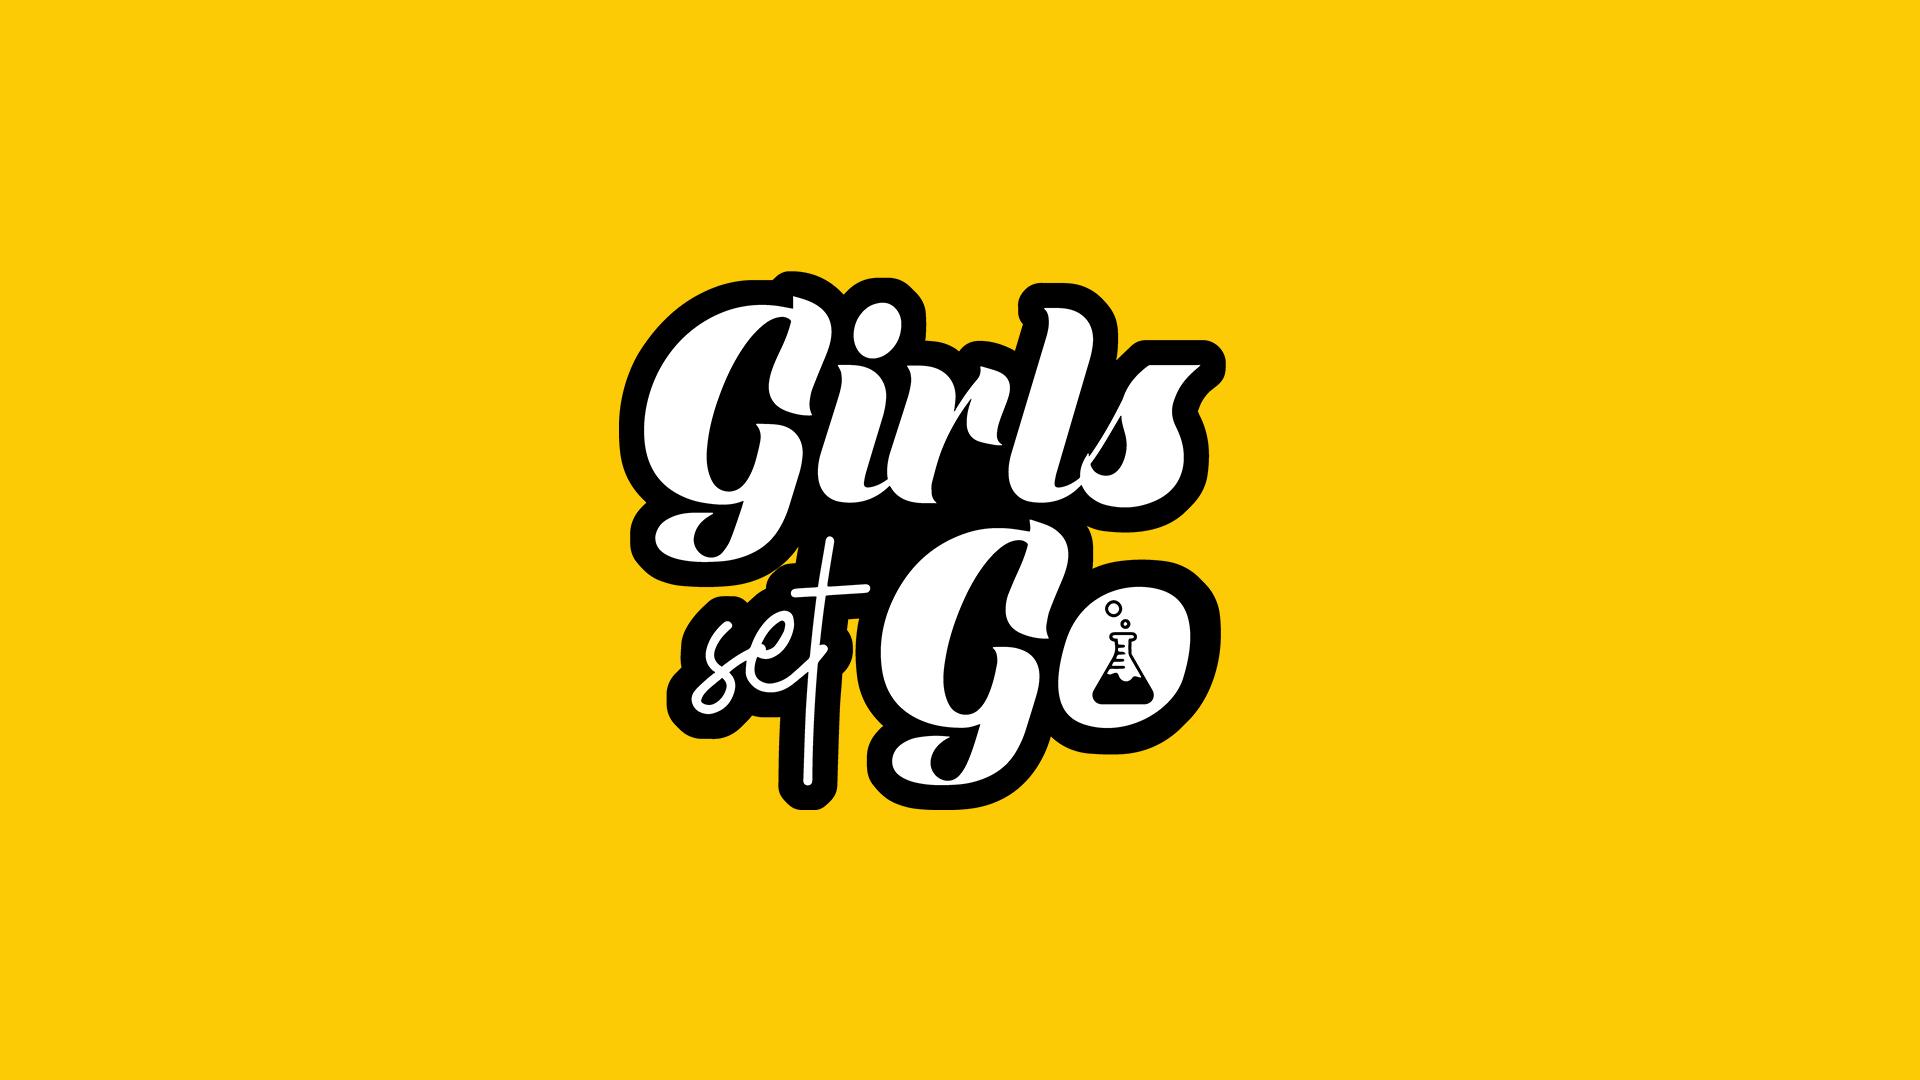 onewildcard_Girl-set-go_Header